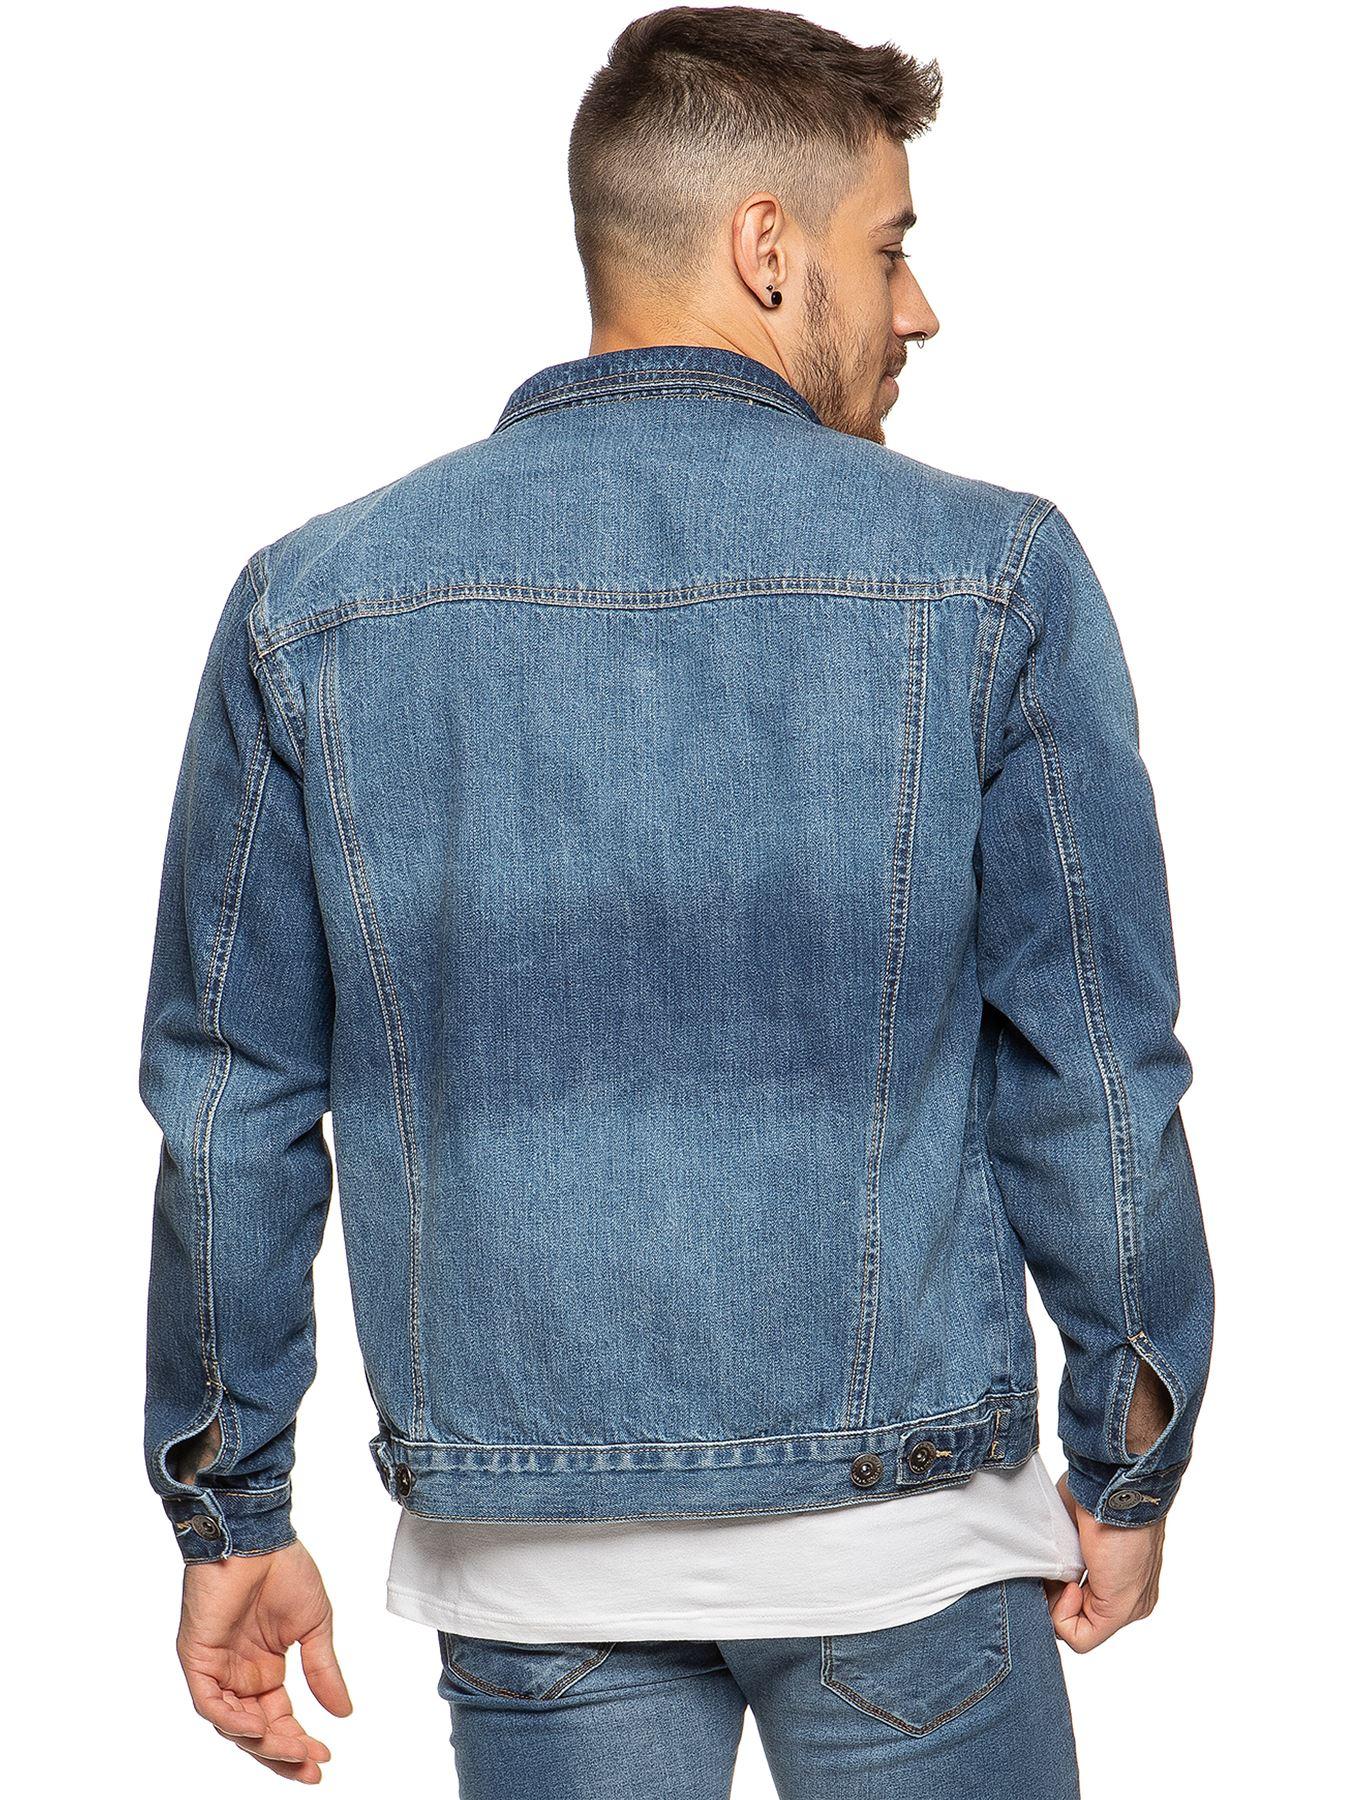 Enzo-Mens-Denim-Jacket-Classic-Western-Style-Designer-Trucker-Vintage-Style-Coat thumbnail 8